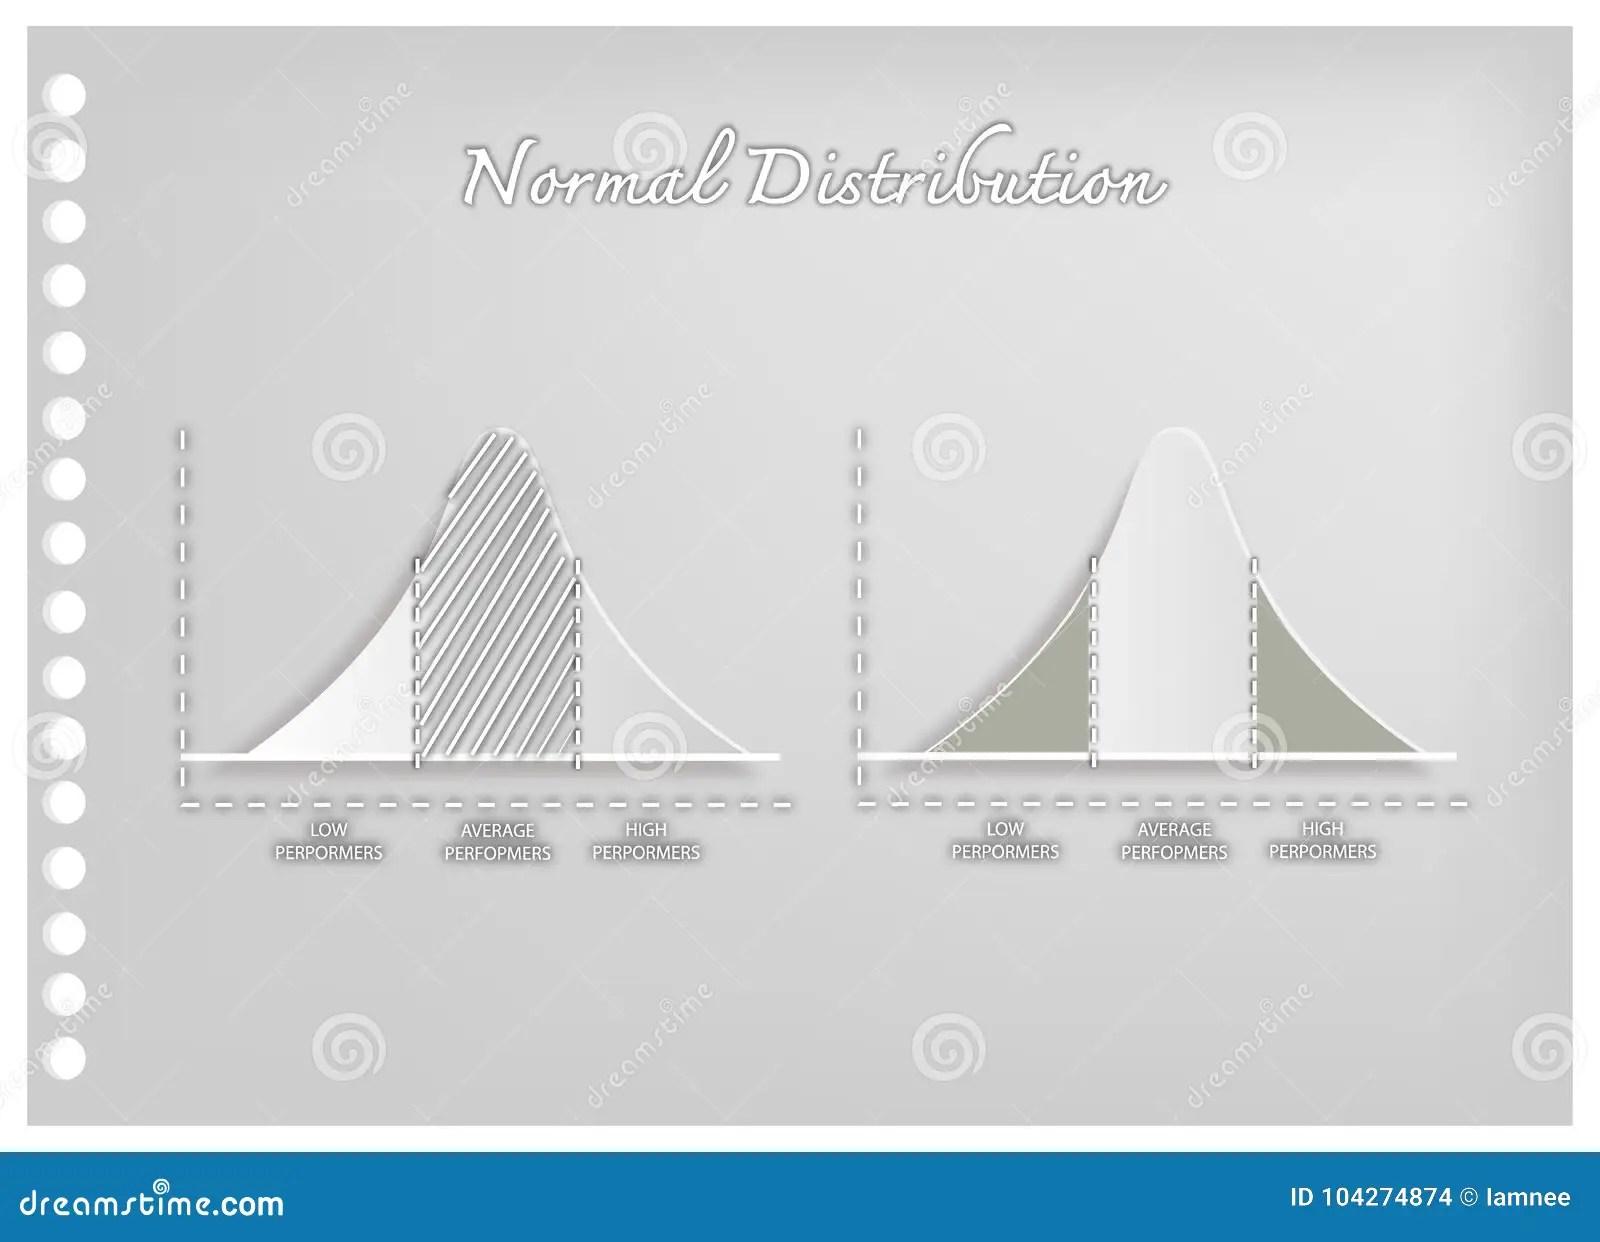 Paper Art Of Standard Deviation Diagram Graphs Stock